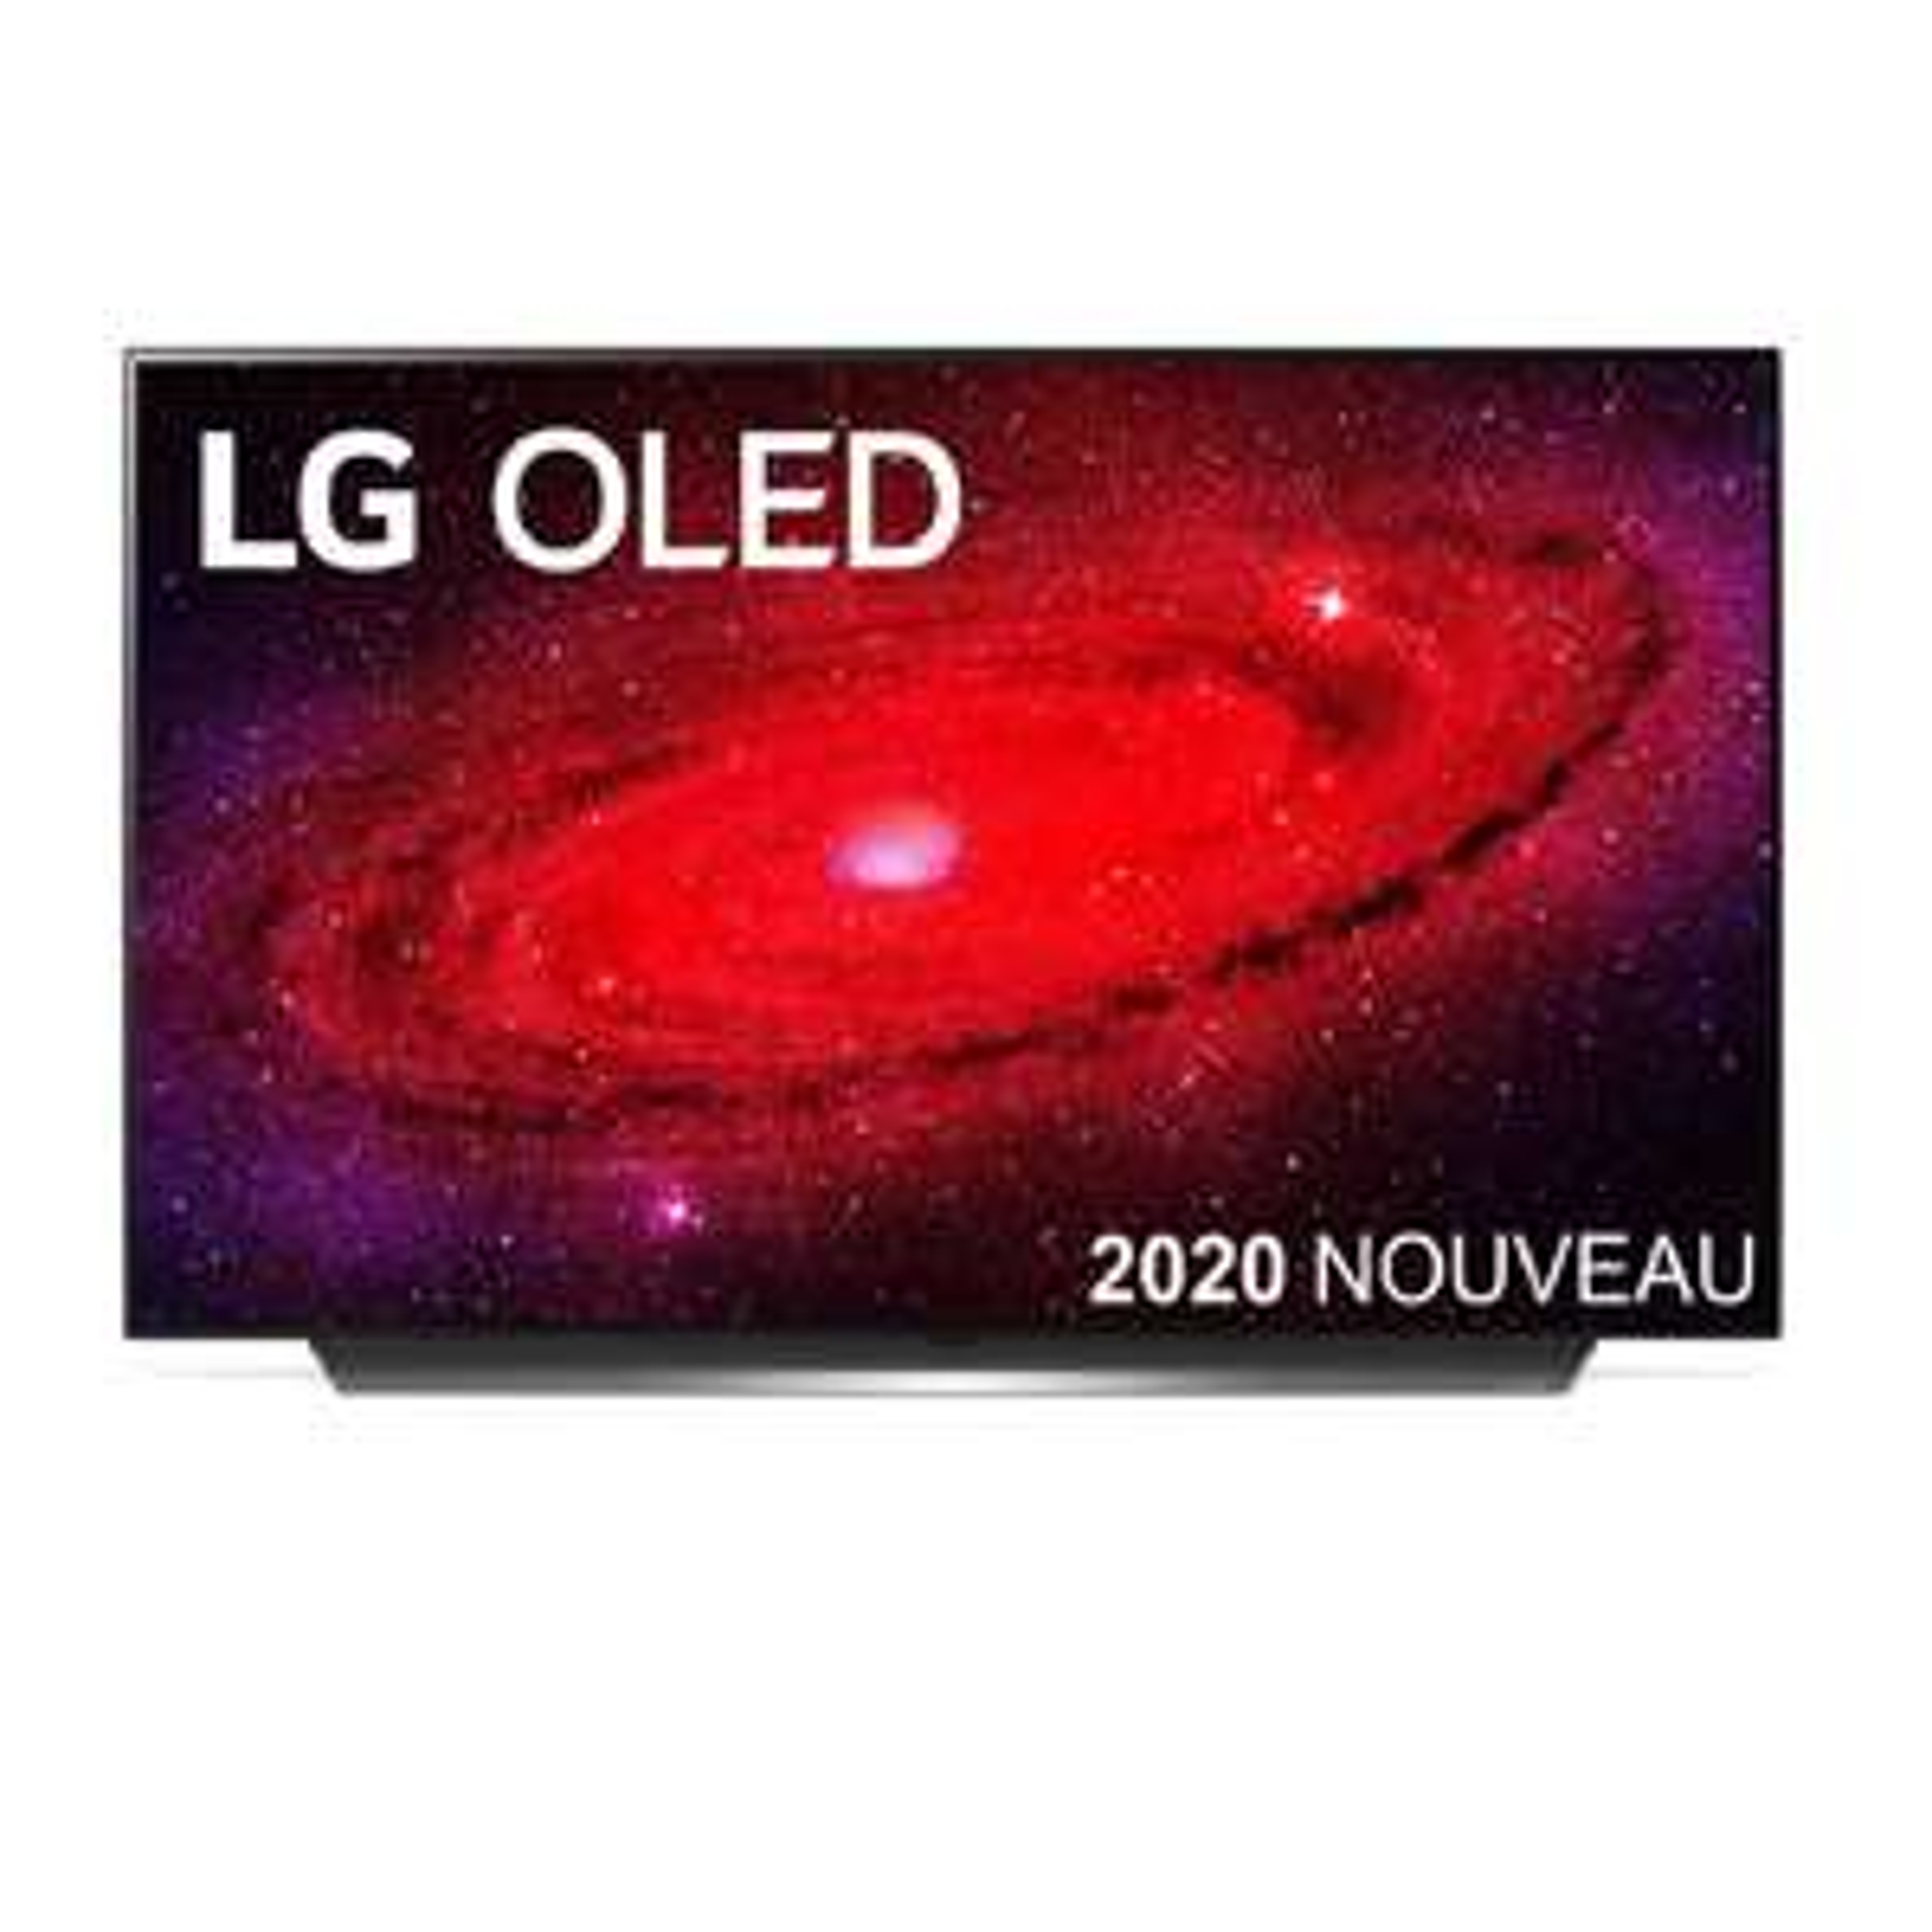 "TV 55"" LG OLED55CX3 - 4K, OLED, Cinéma HDR, 100Hz, HDMI 2.1, Dolby Vision iQ & Atmos, FreeSync, Smart TV (1092€ avec RAKUTEN30 + 112€ de RP)"